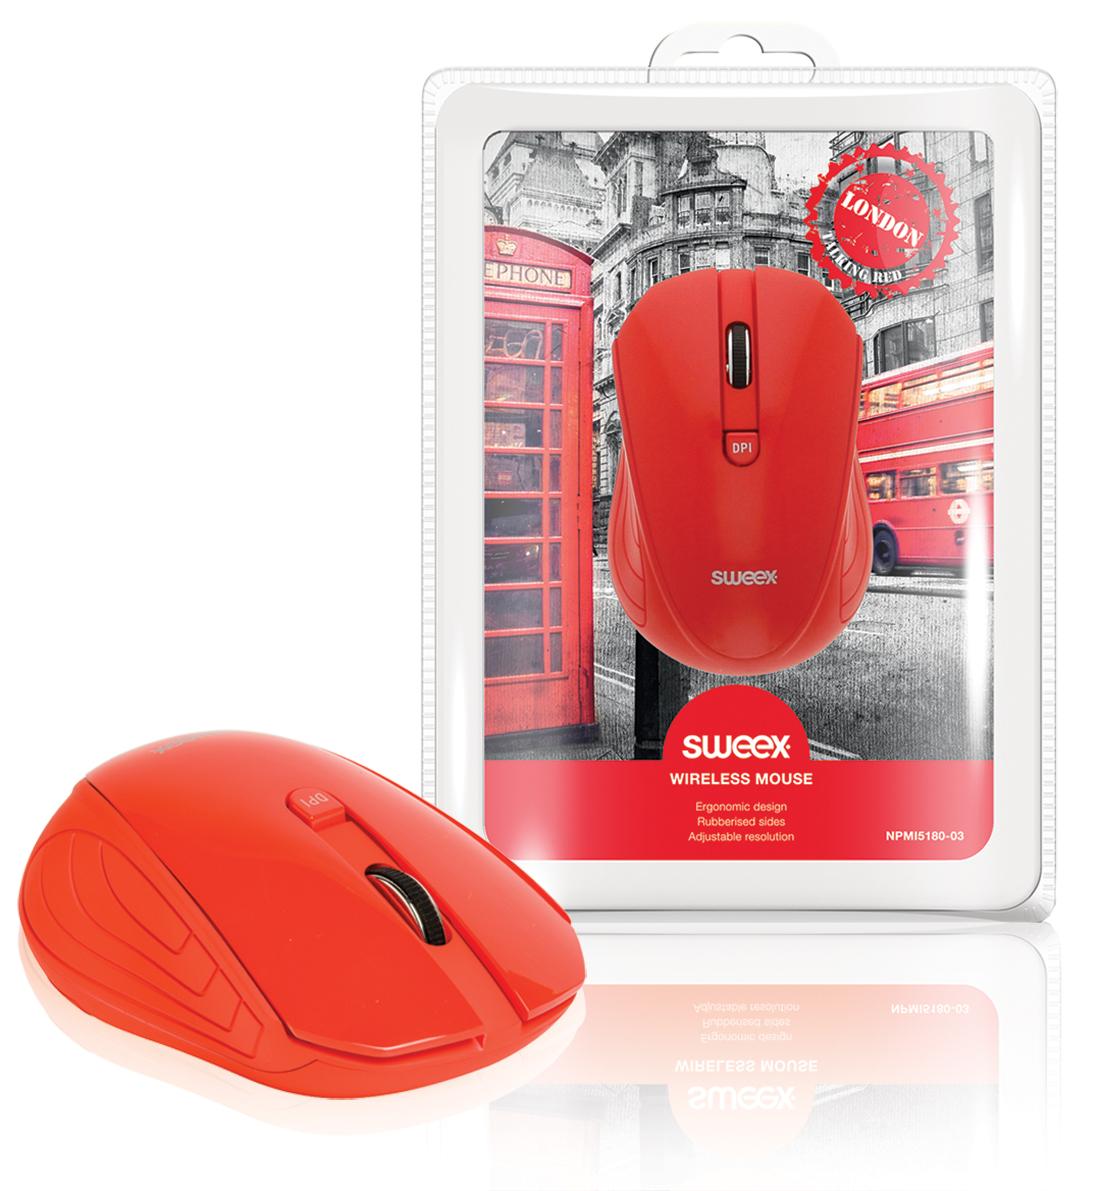 Sweex NPMI5180-03 - Bezdrátová myš London